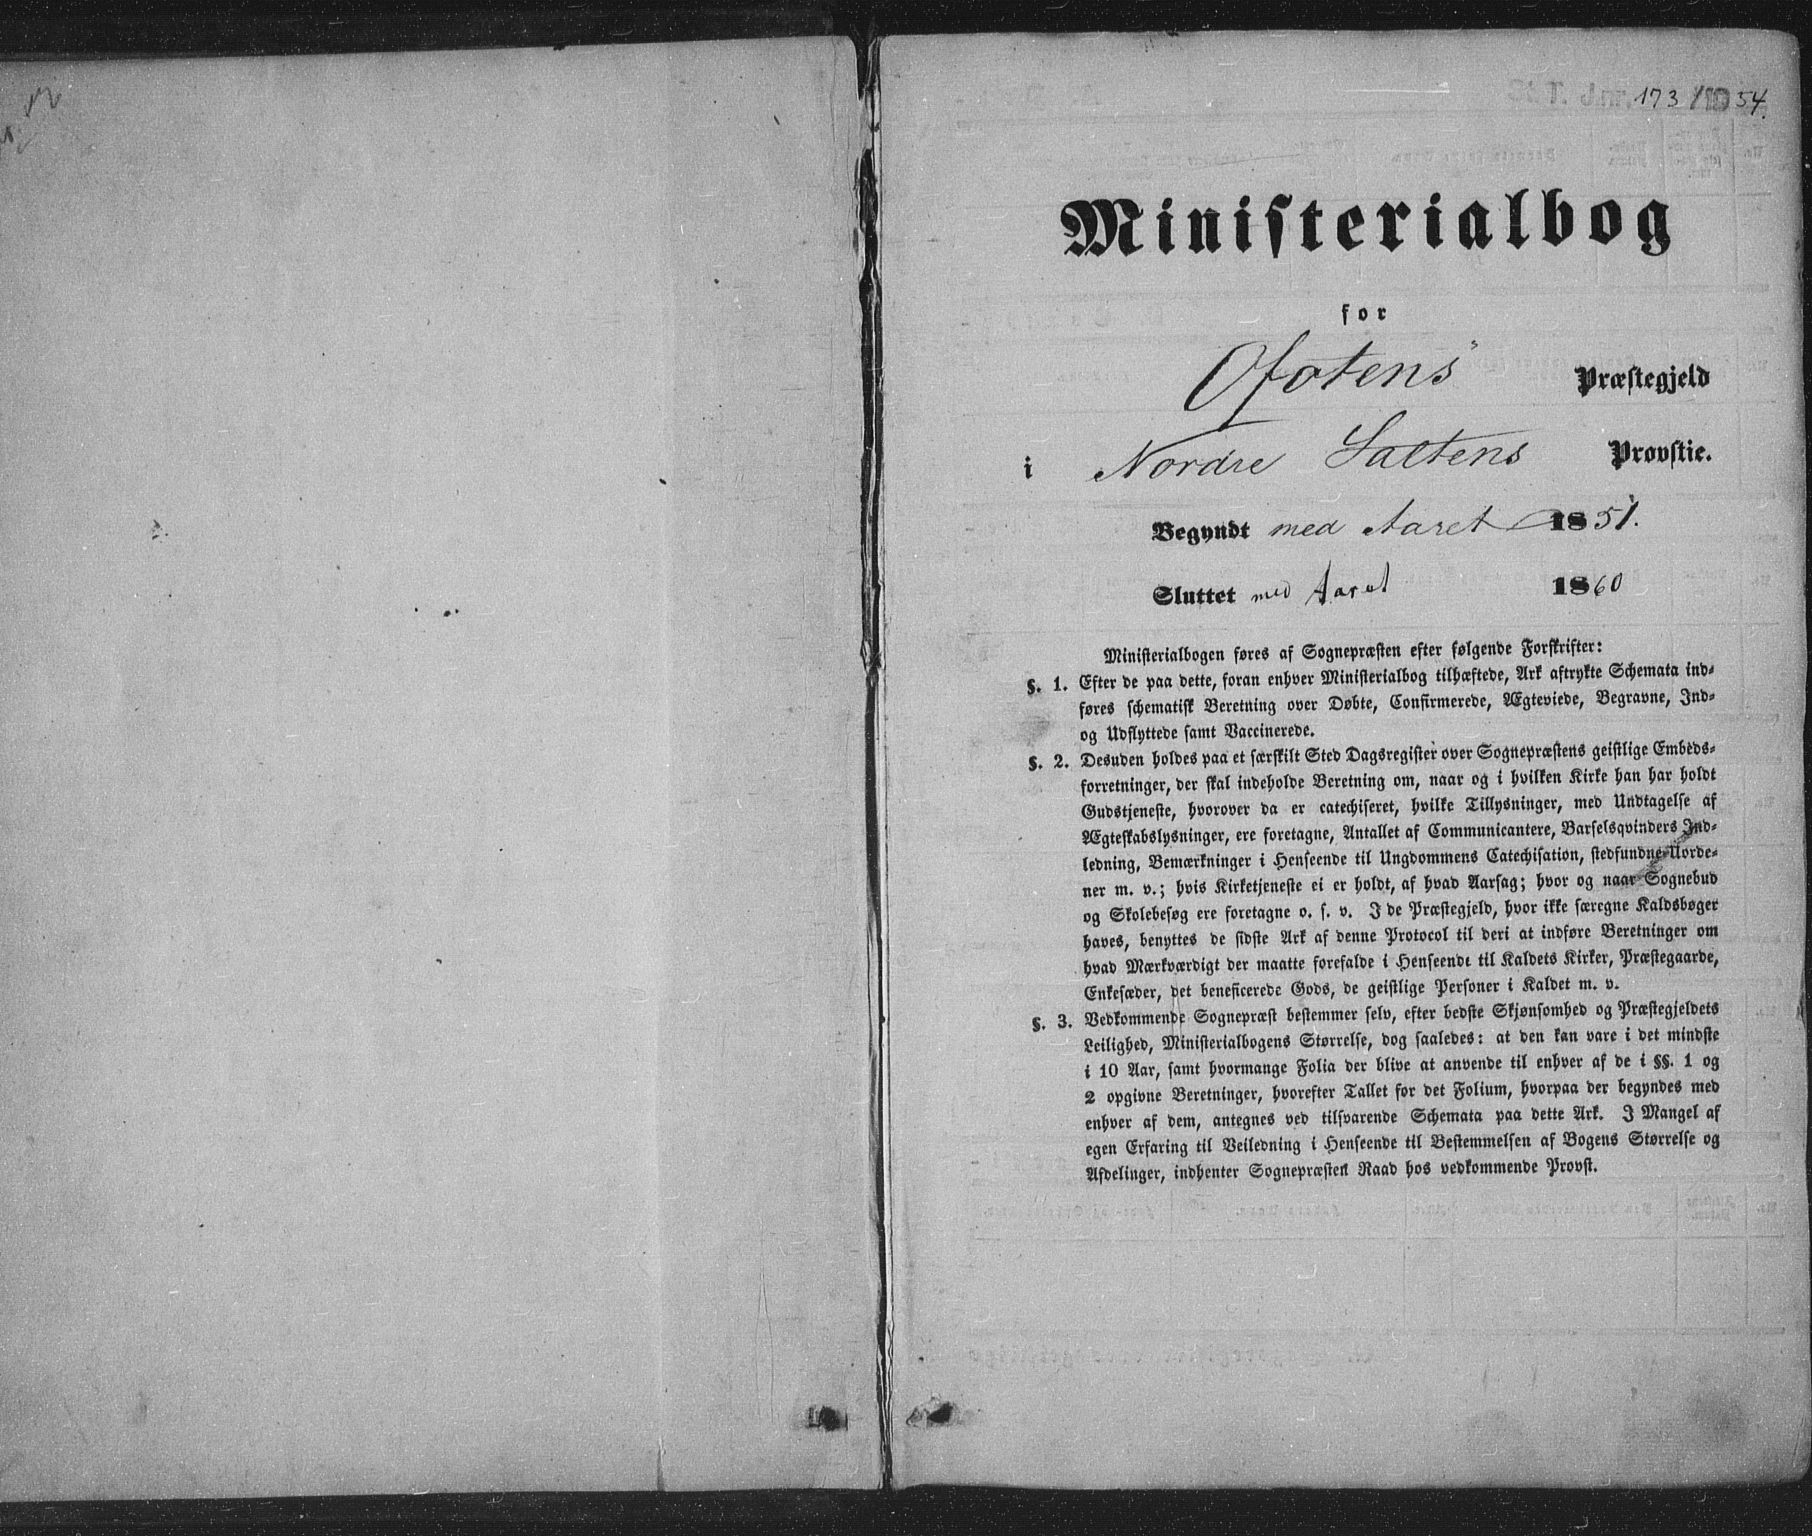 SAT, Ministerialprotokoller, klokkerbøker og fødselsregistre - Nordland, 863/L0895: Ministerialbok nr. 863A07, 1851-1860